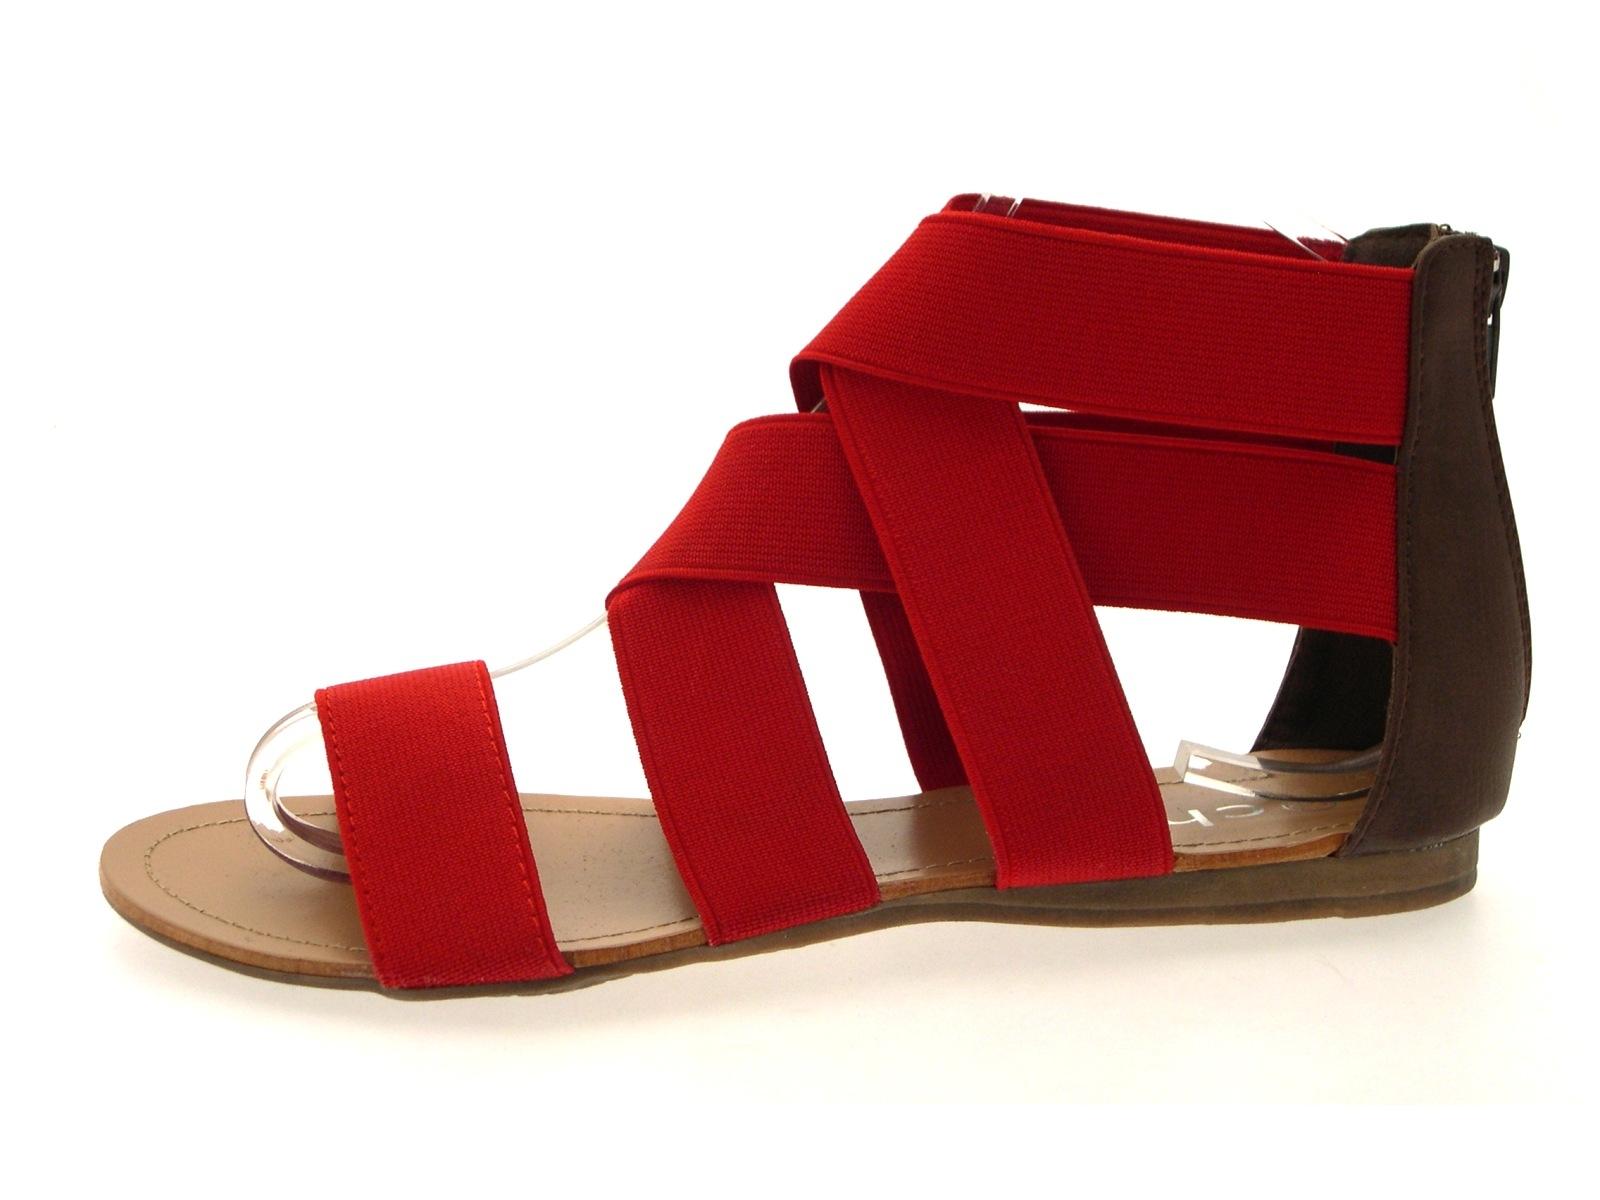 Womens Elastic Strap Gladiator Summer Sandals Ladies Flat Shoes Size UK 3 - 8